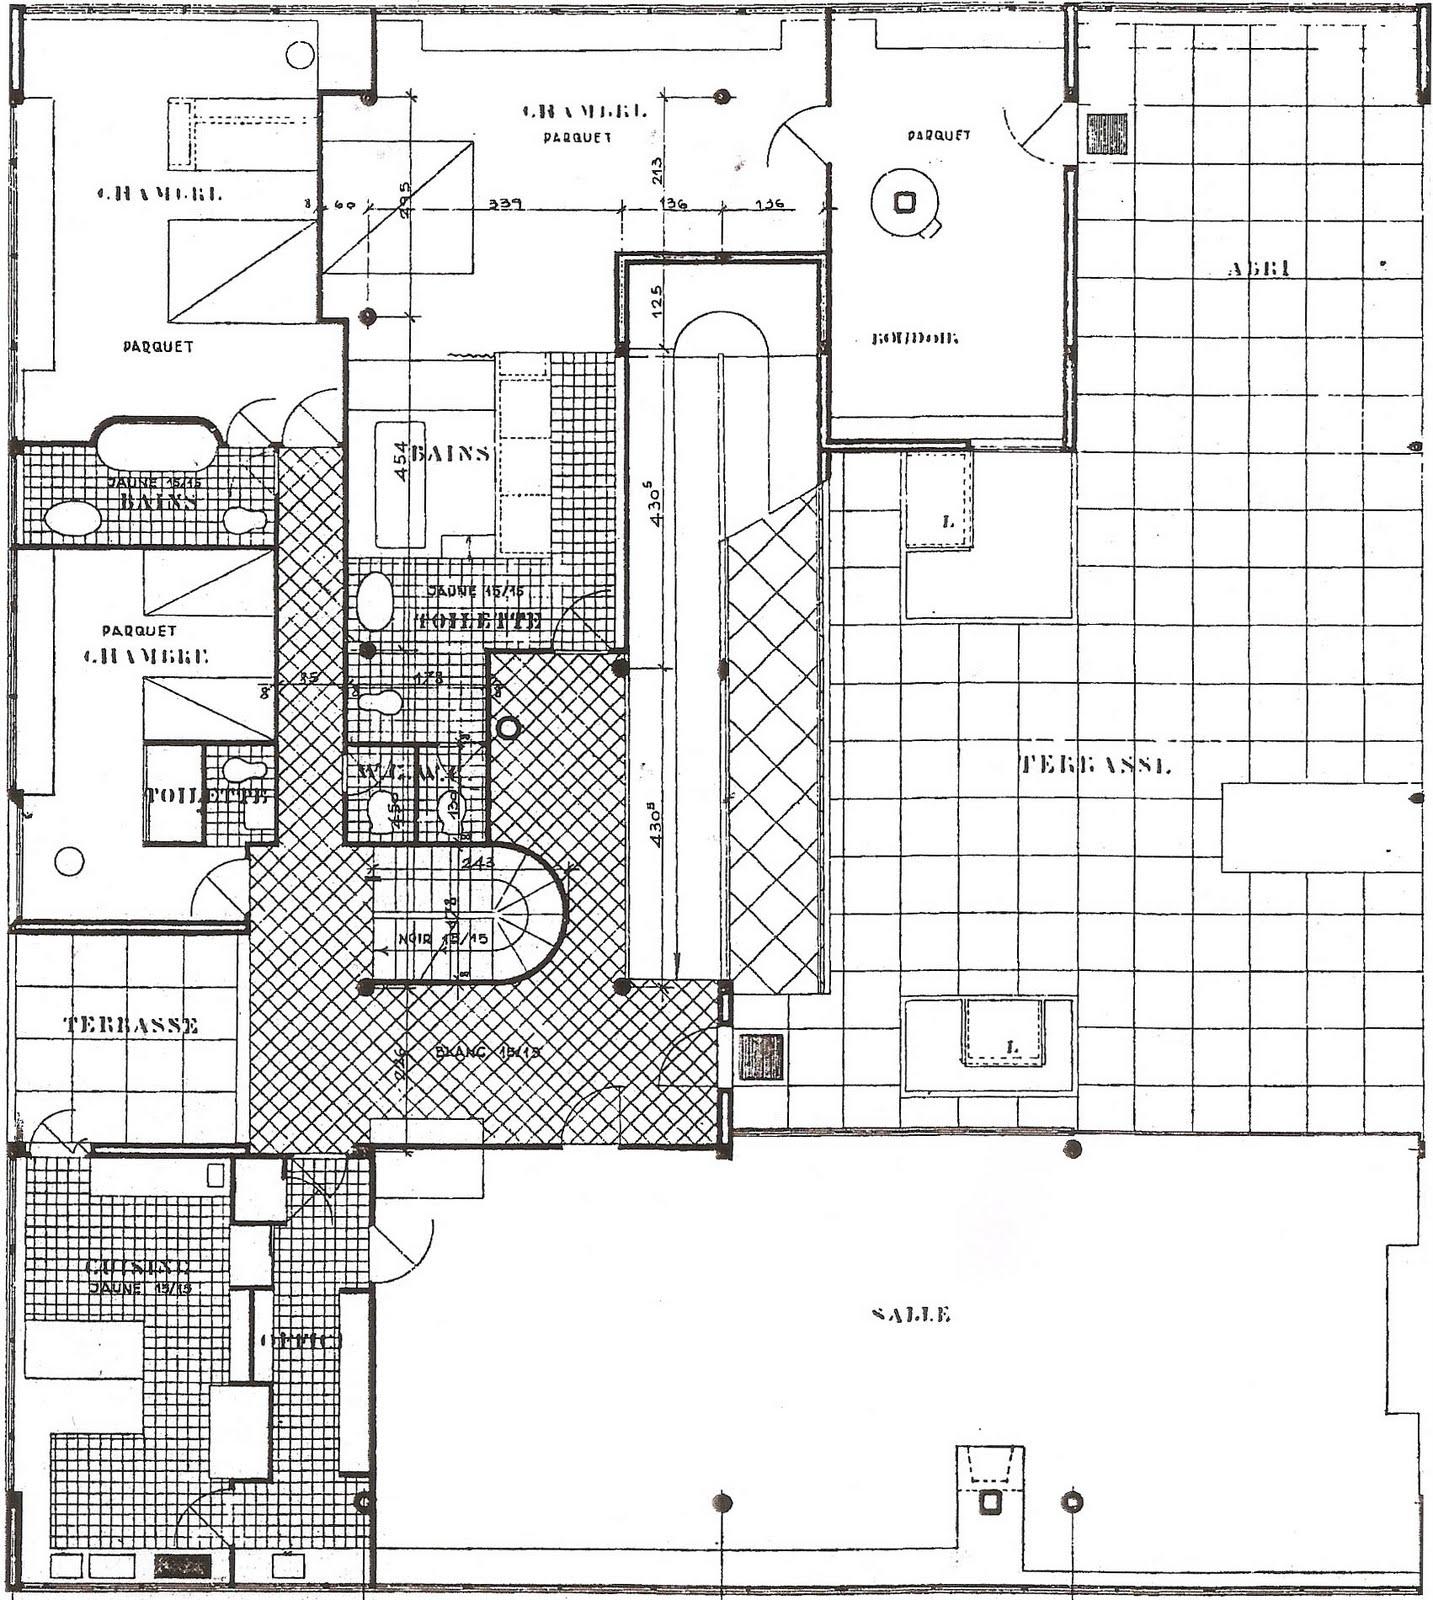 Villa Site Plan Design: Linh Nguyen ARCH1201: Villa Savoye